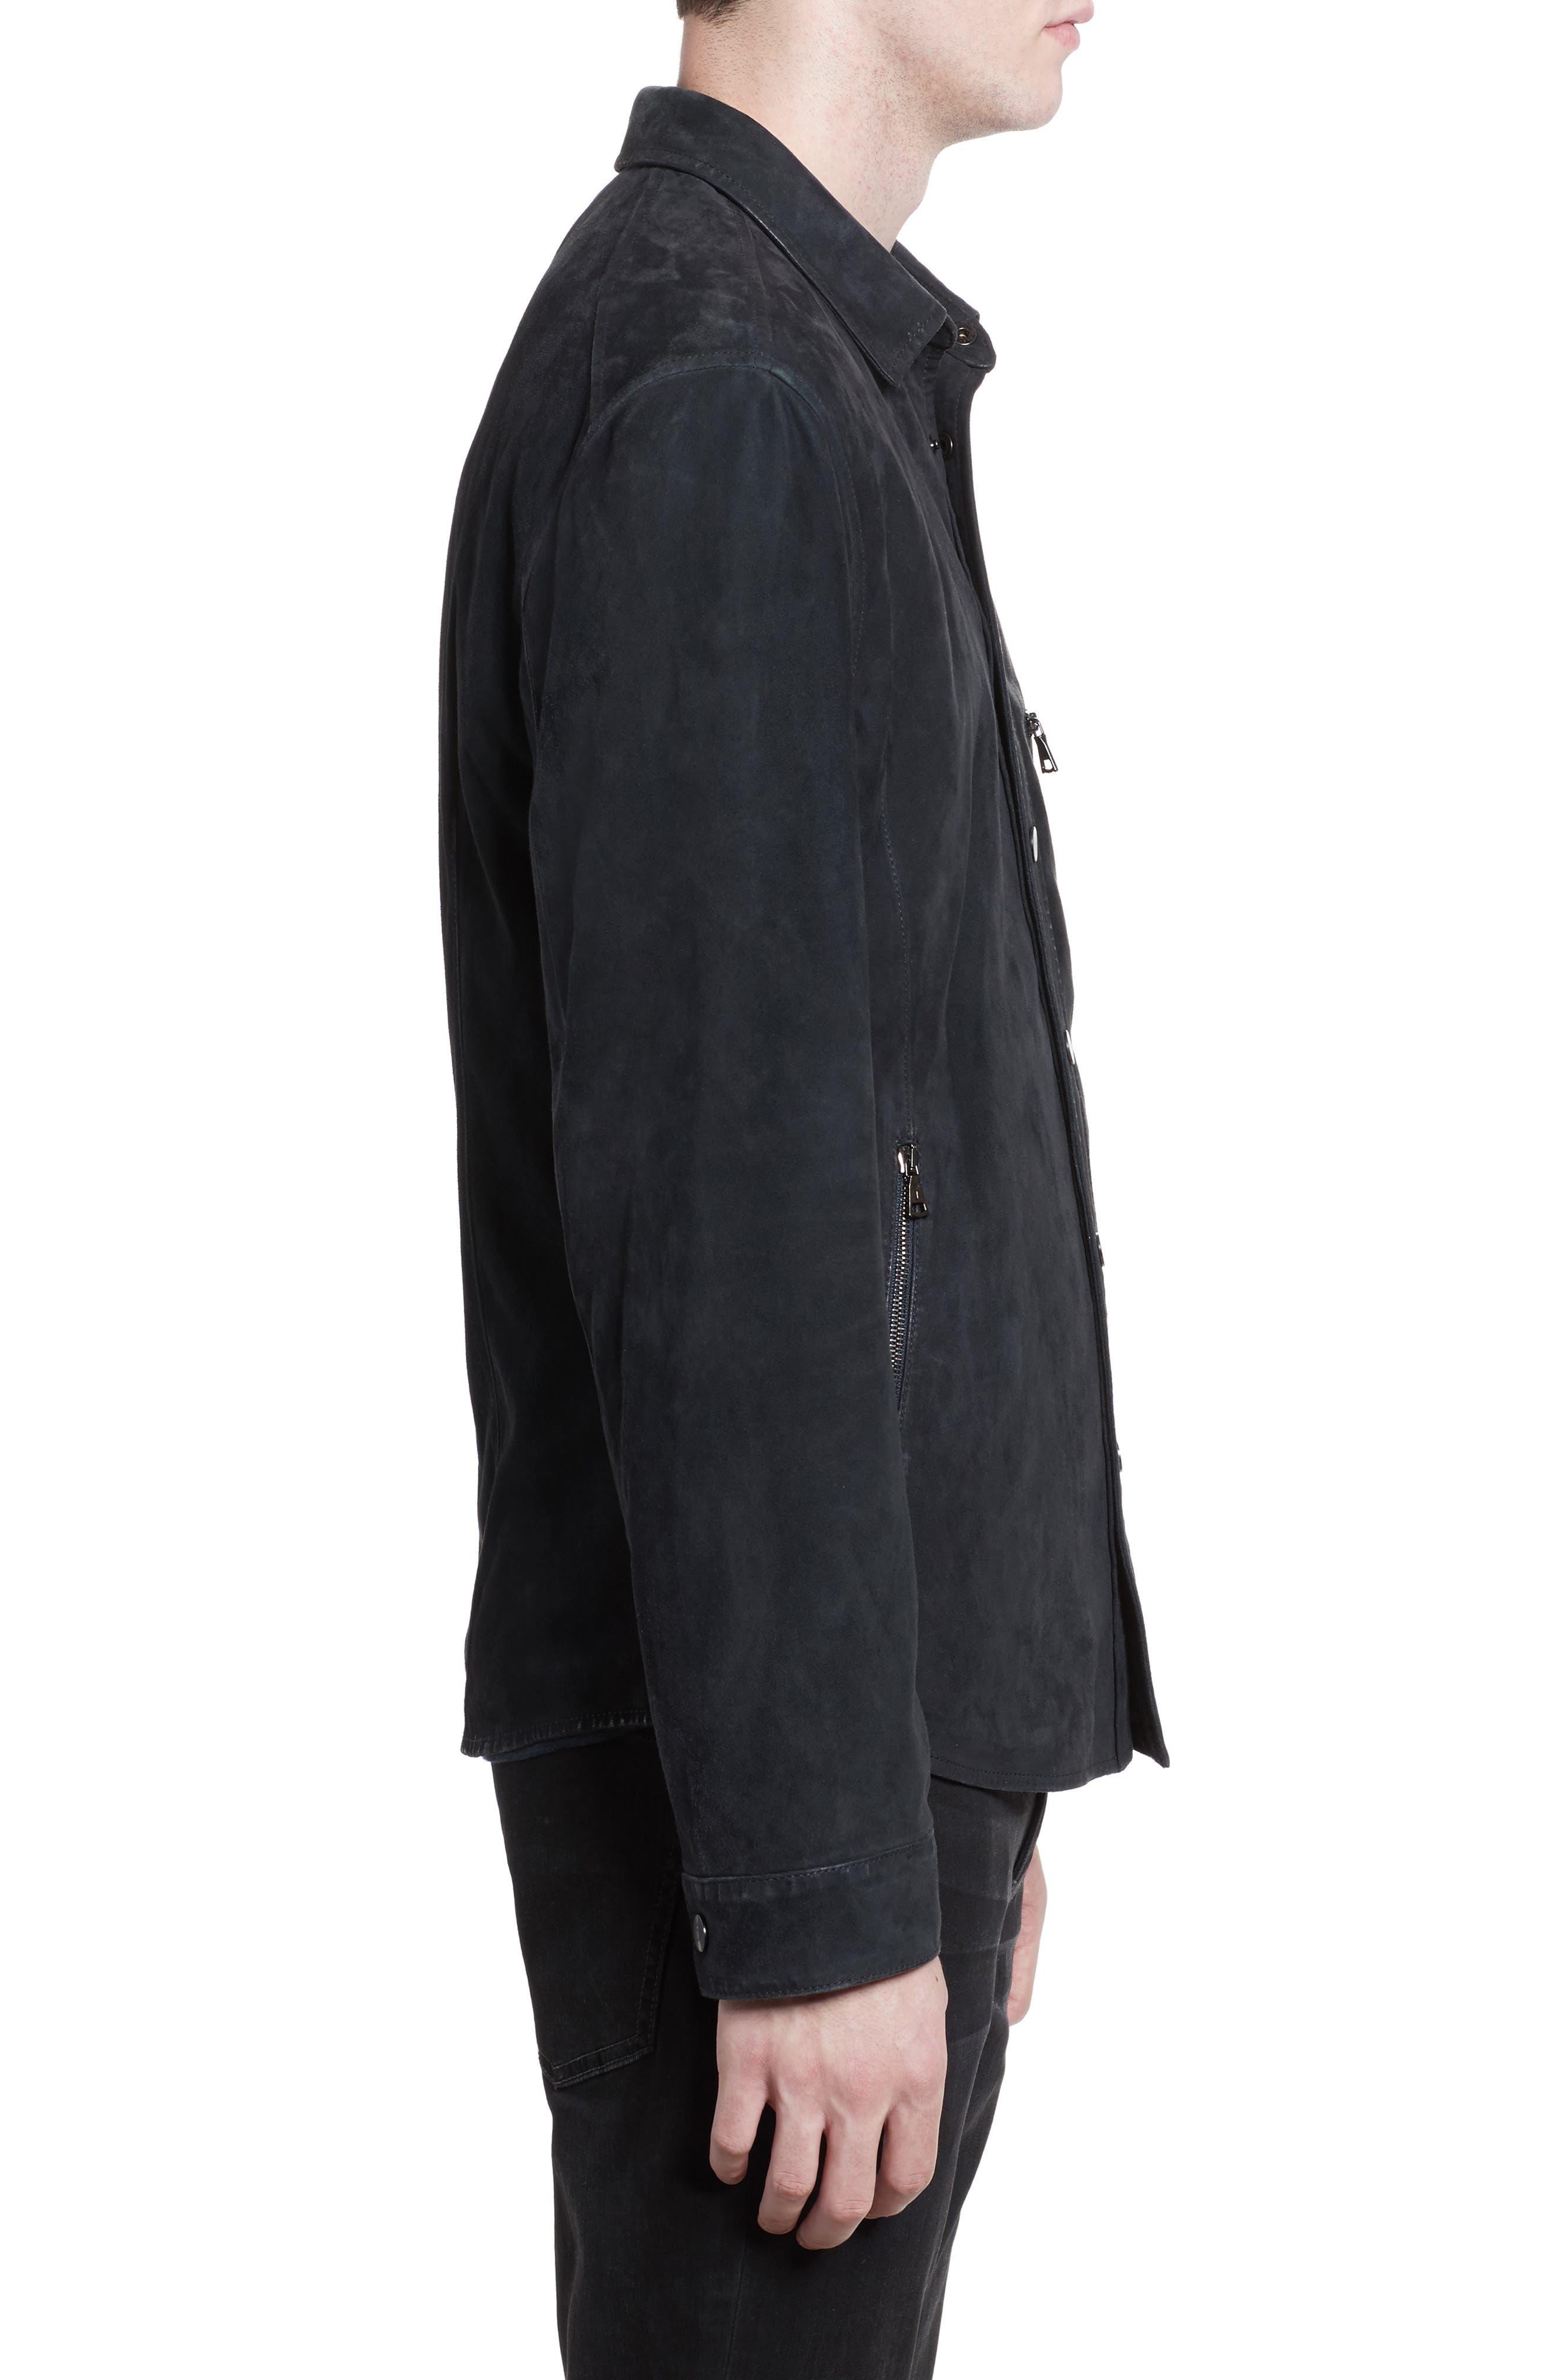 JOHN VARVATOS, Suede Shirt Jacket, Alternate thumbnail 3, color, MIDNIGHT